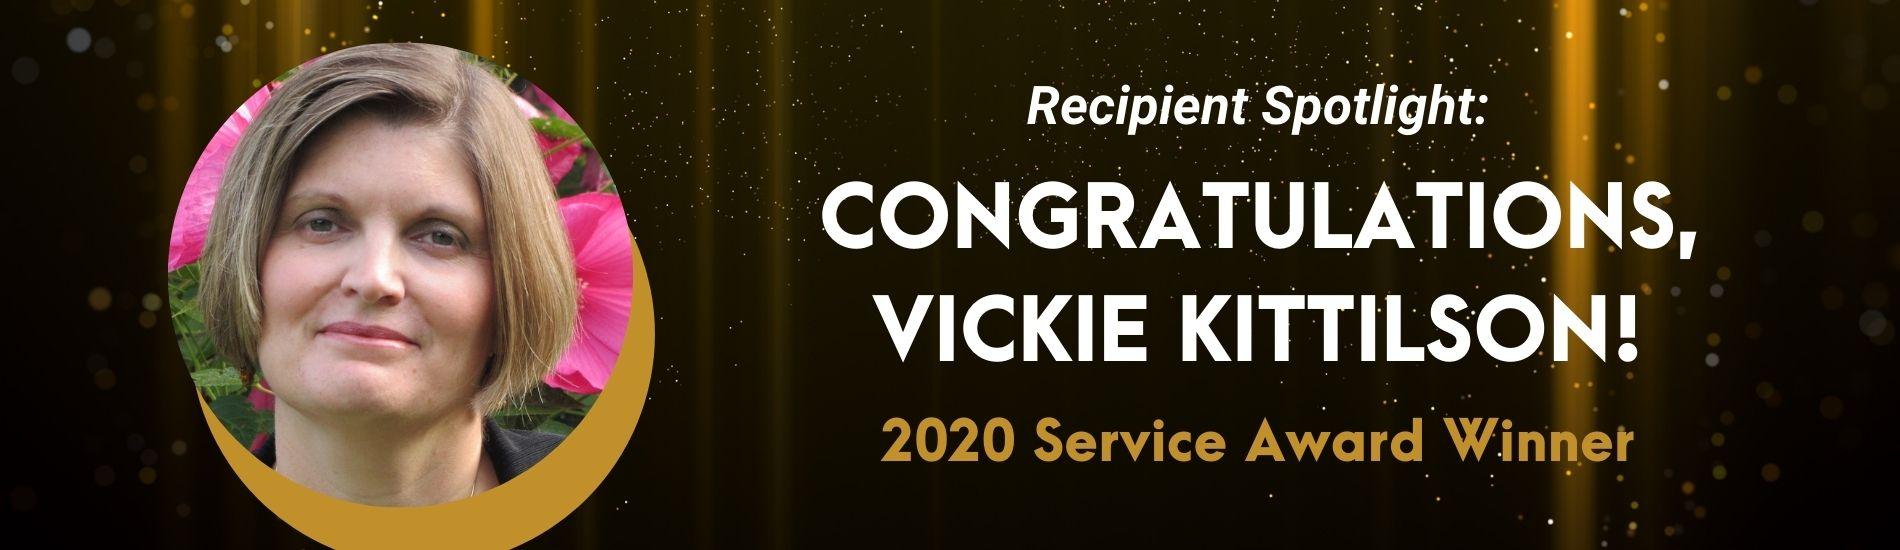 Vickie Kittilson Service Award Winner